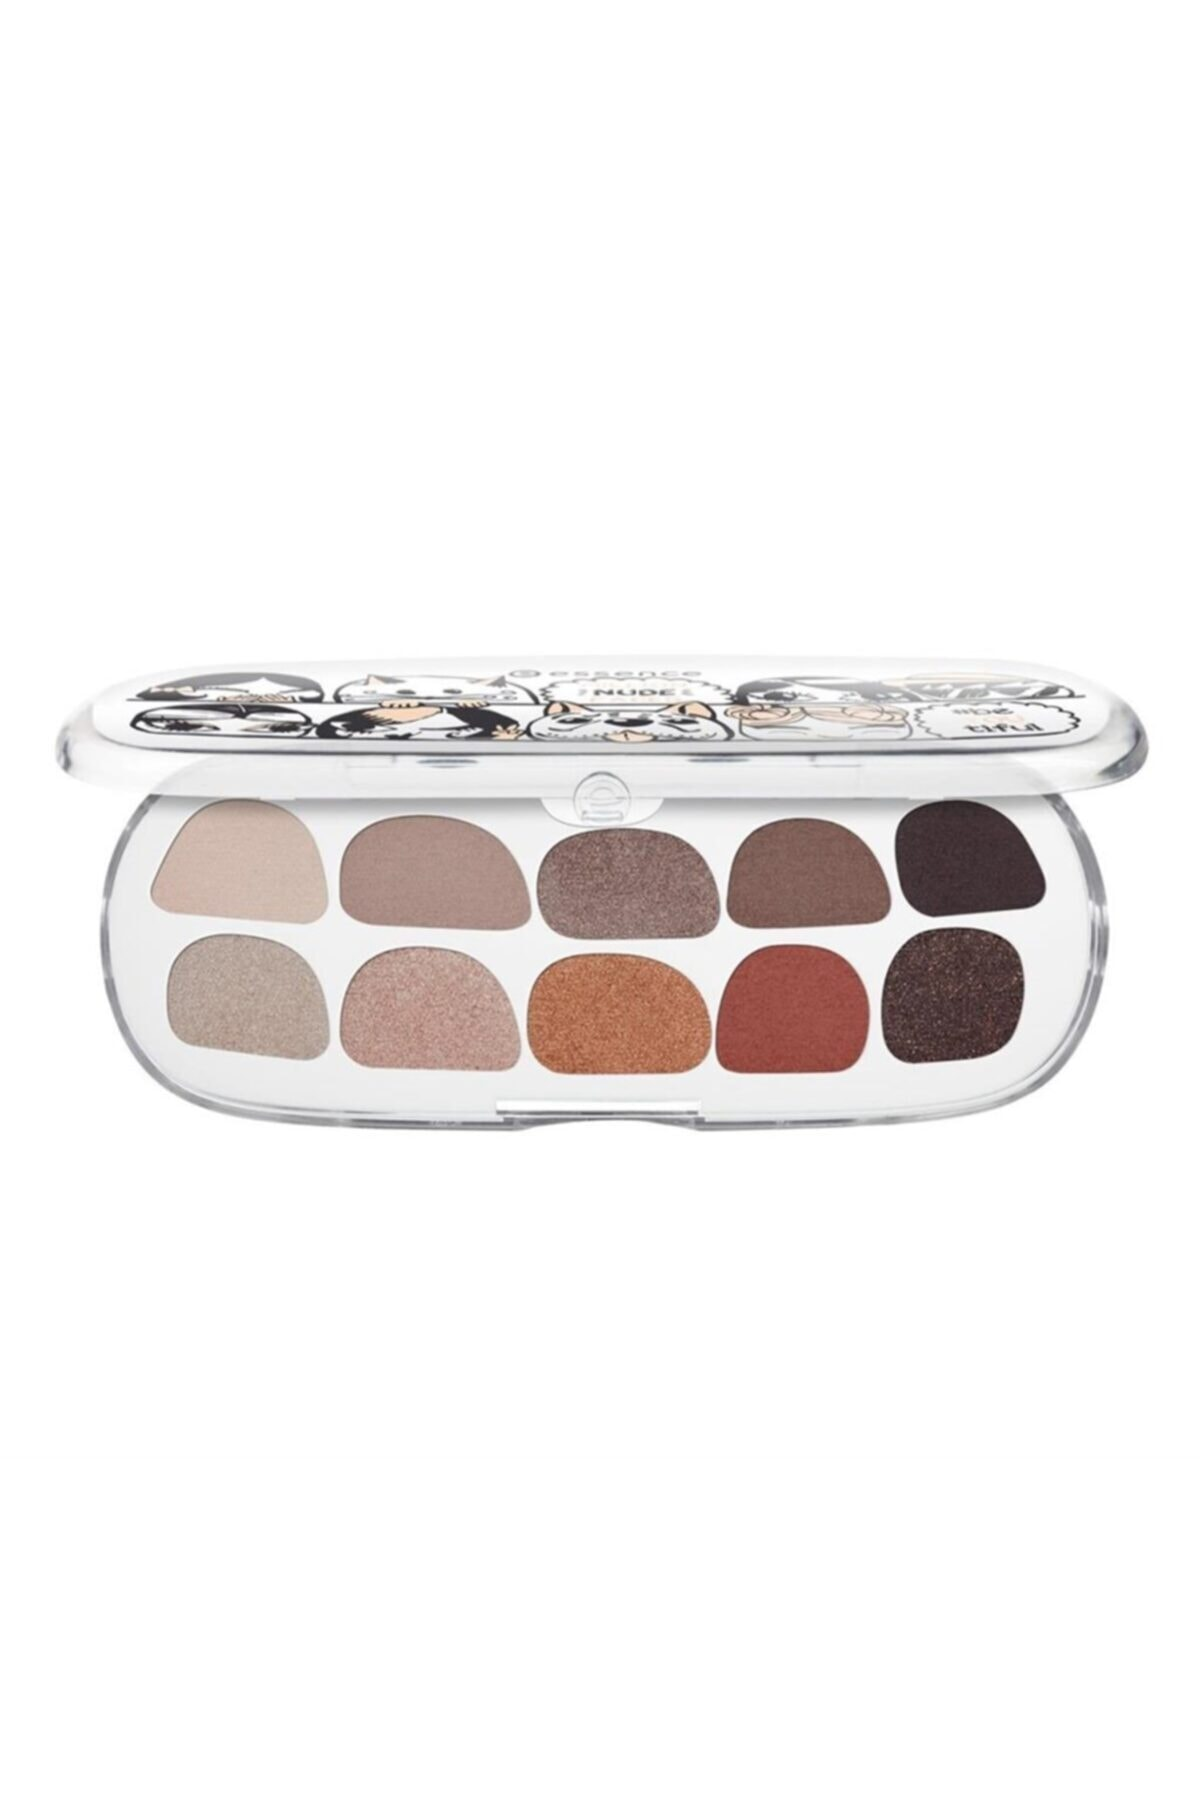 Essence Göz Farı Paleti - Million Nude Faces Eyeshadow Box 01 4059729005038 1